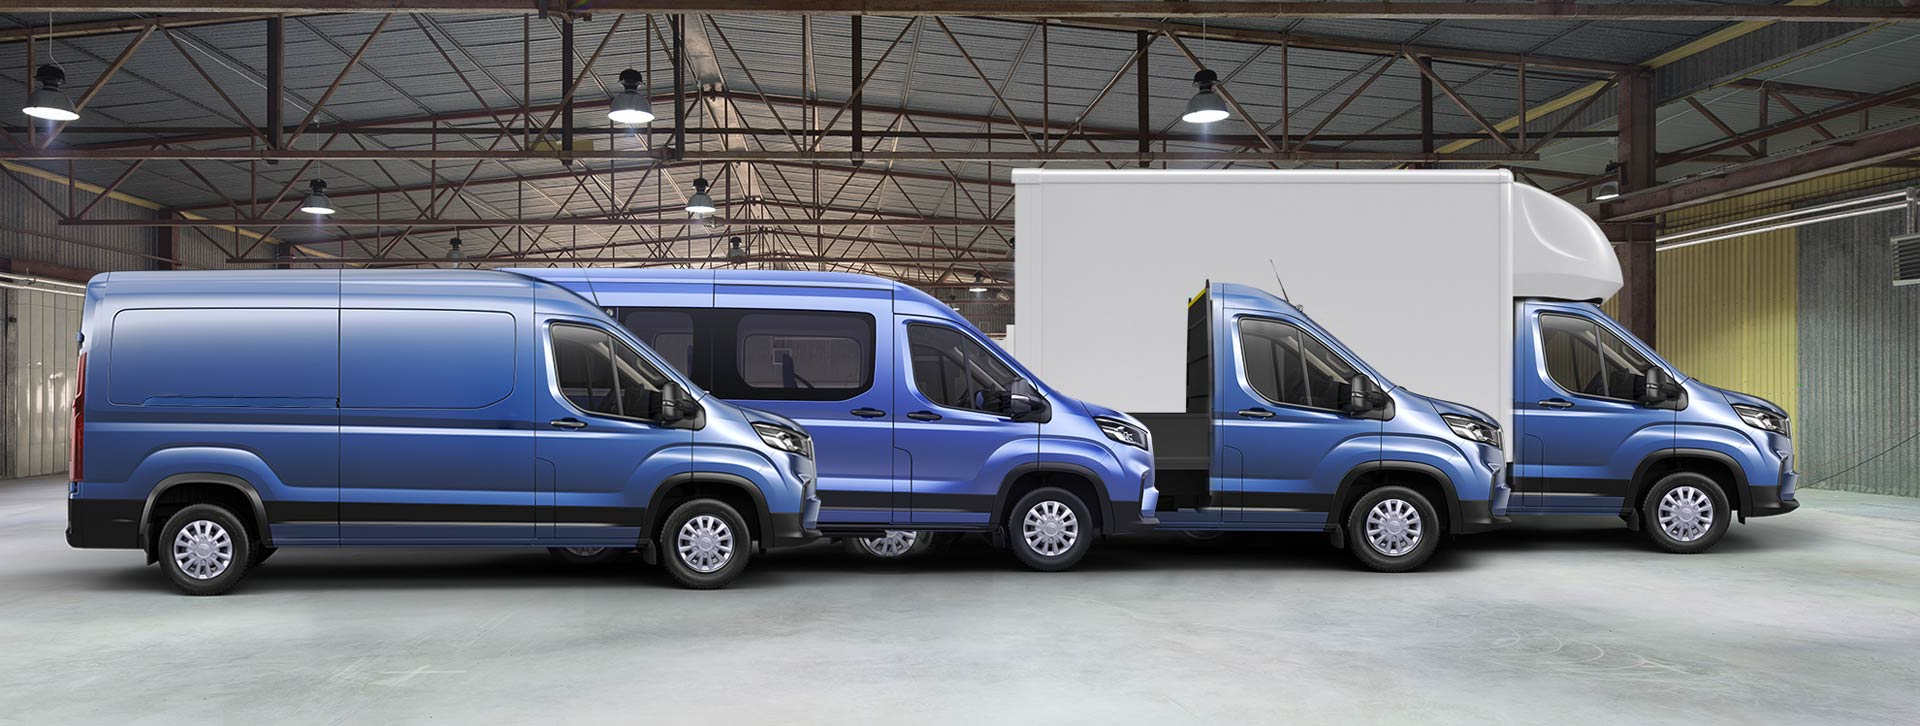 LDV Van Range from Heathrow LDV Ltd